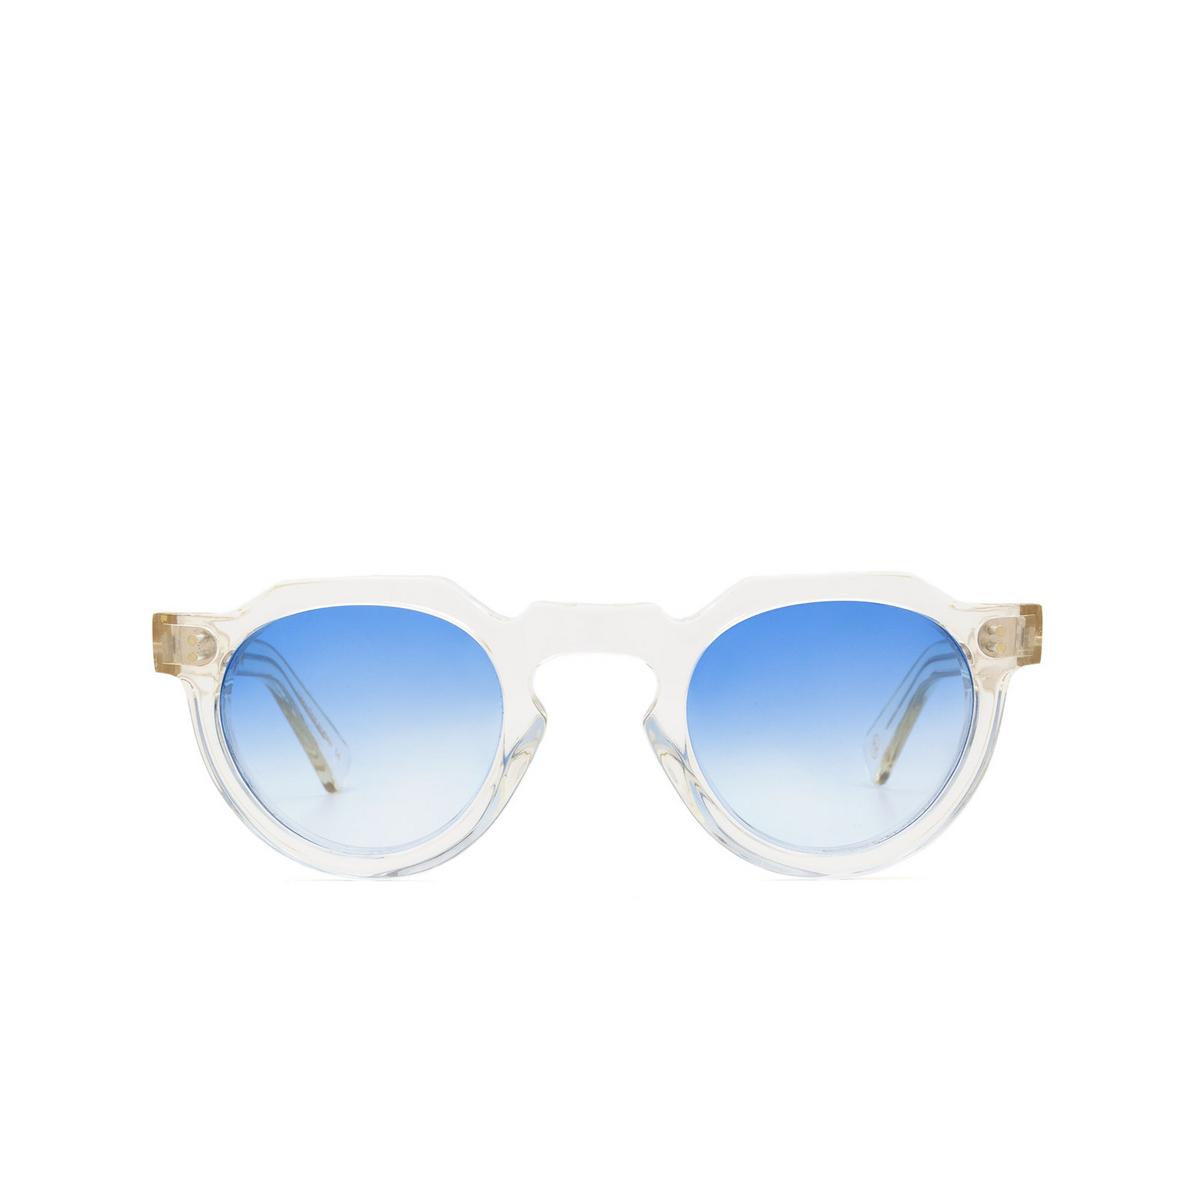 Lesca® Irregular Sunglasses: Crown Panto X Mia Burton color 21 - COOL / RADIANT GRADIENT - front view.